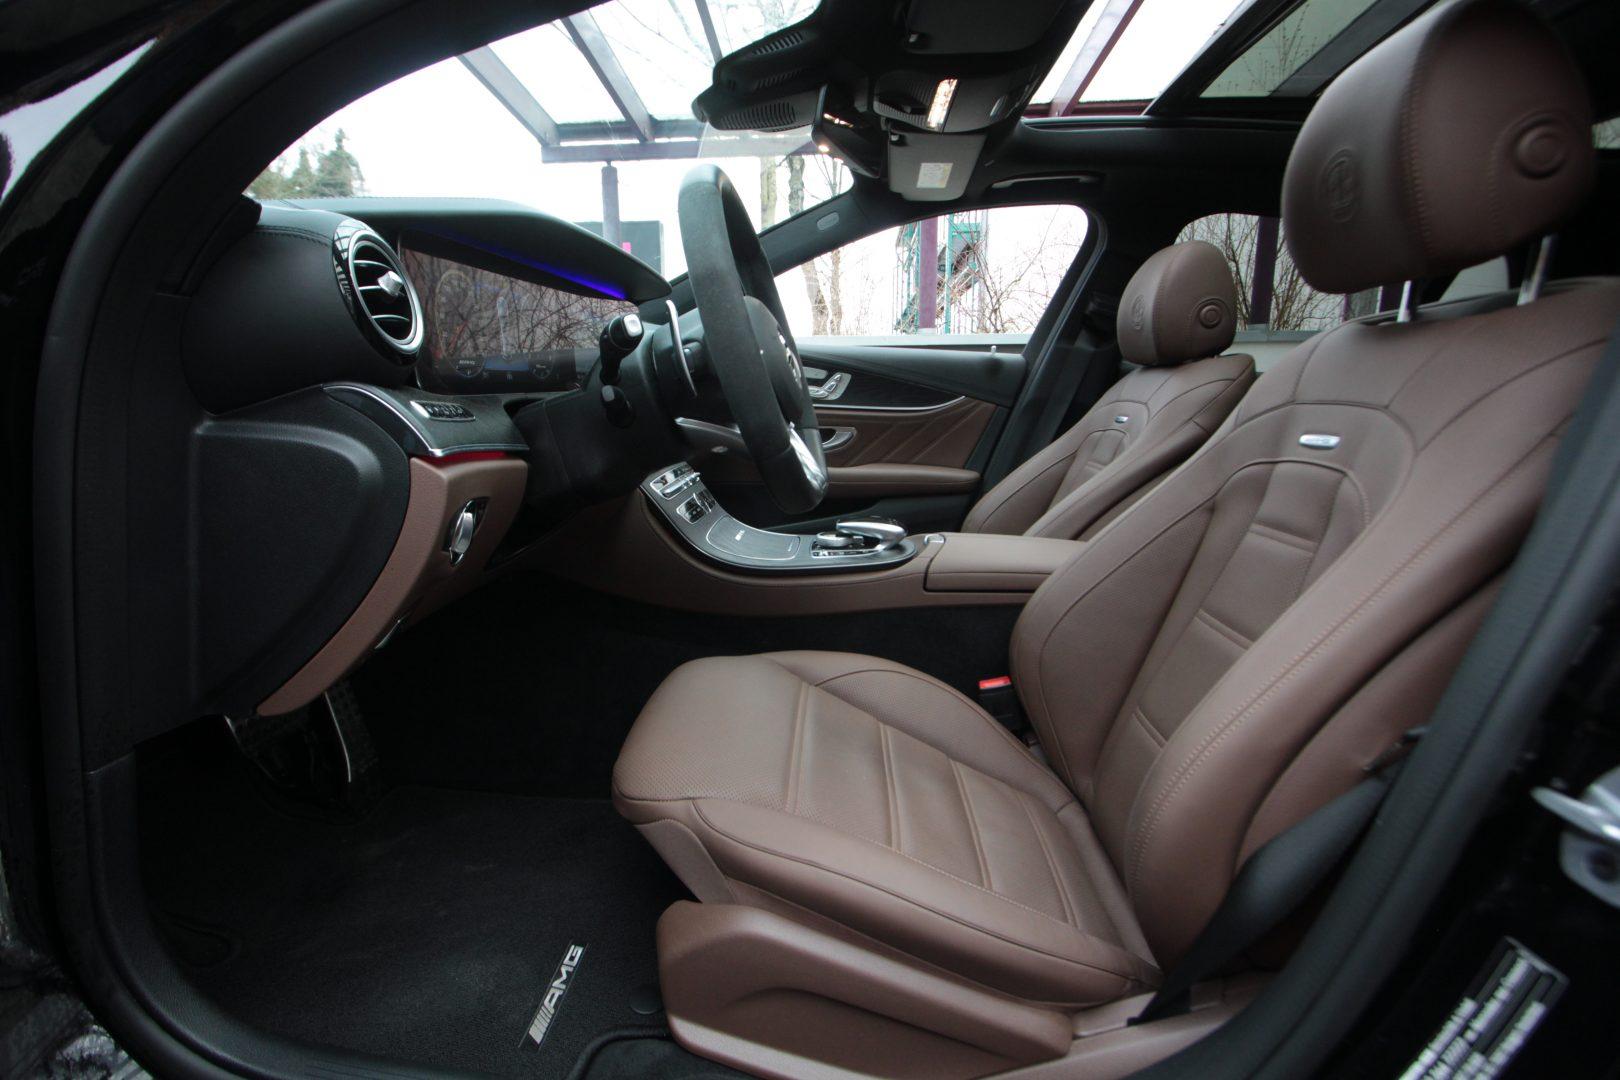 AIL Mercedes-Benz  E 63 AMG S 4Matic 7